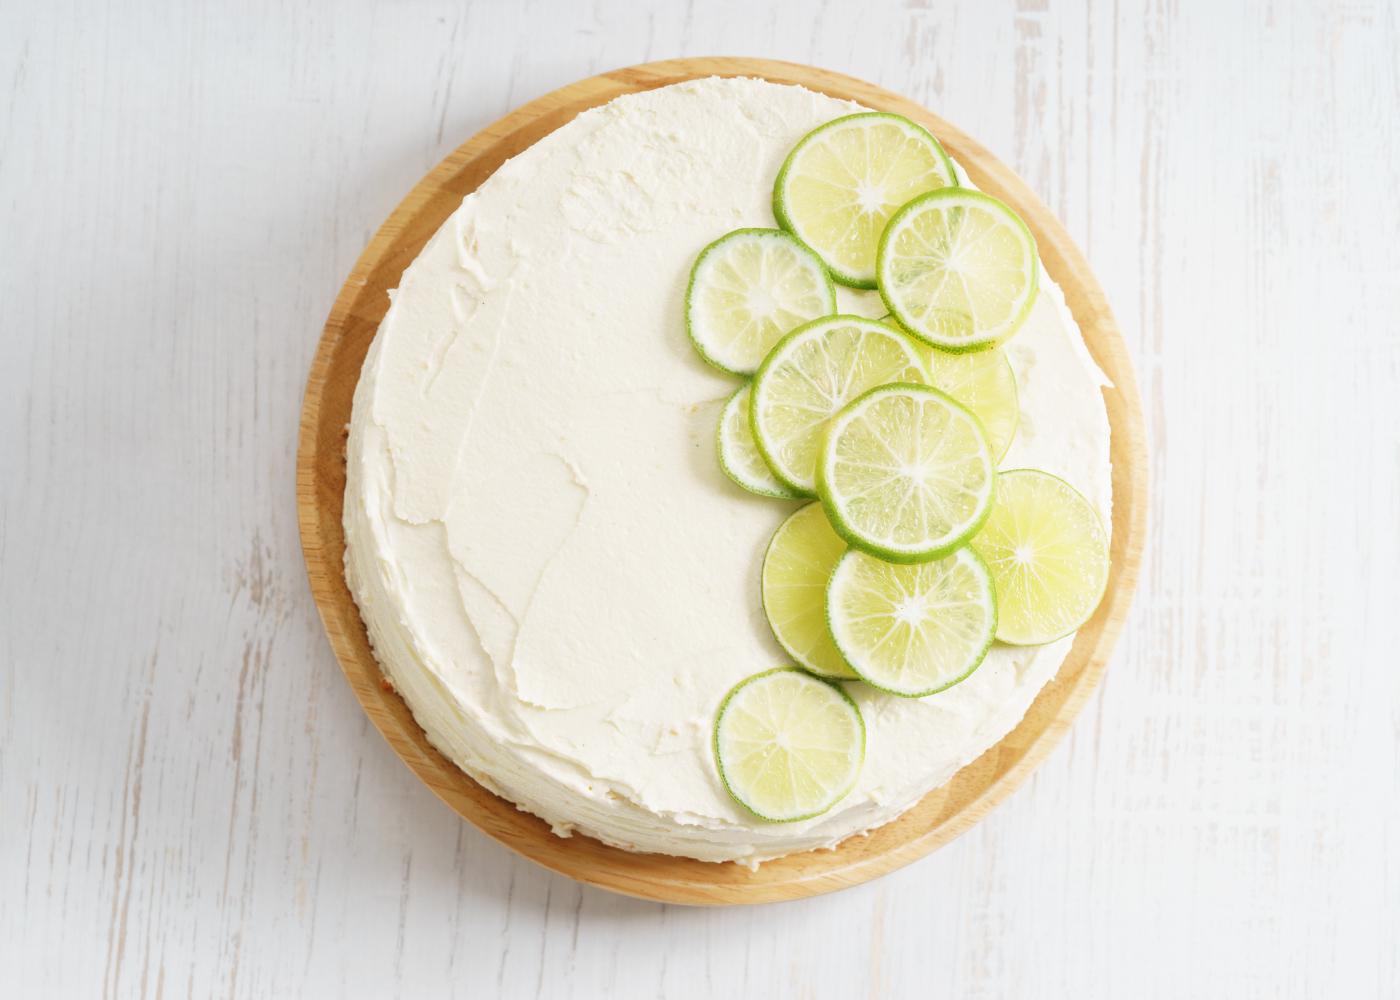 tarte de lima receitas para sobremesas